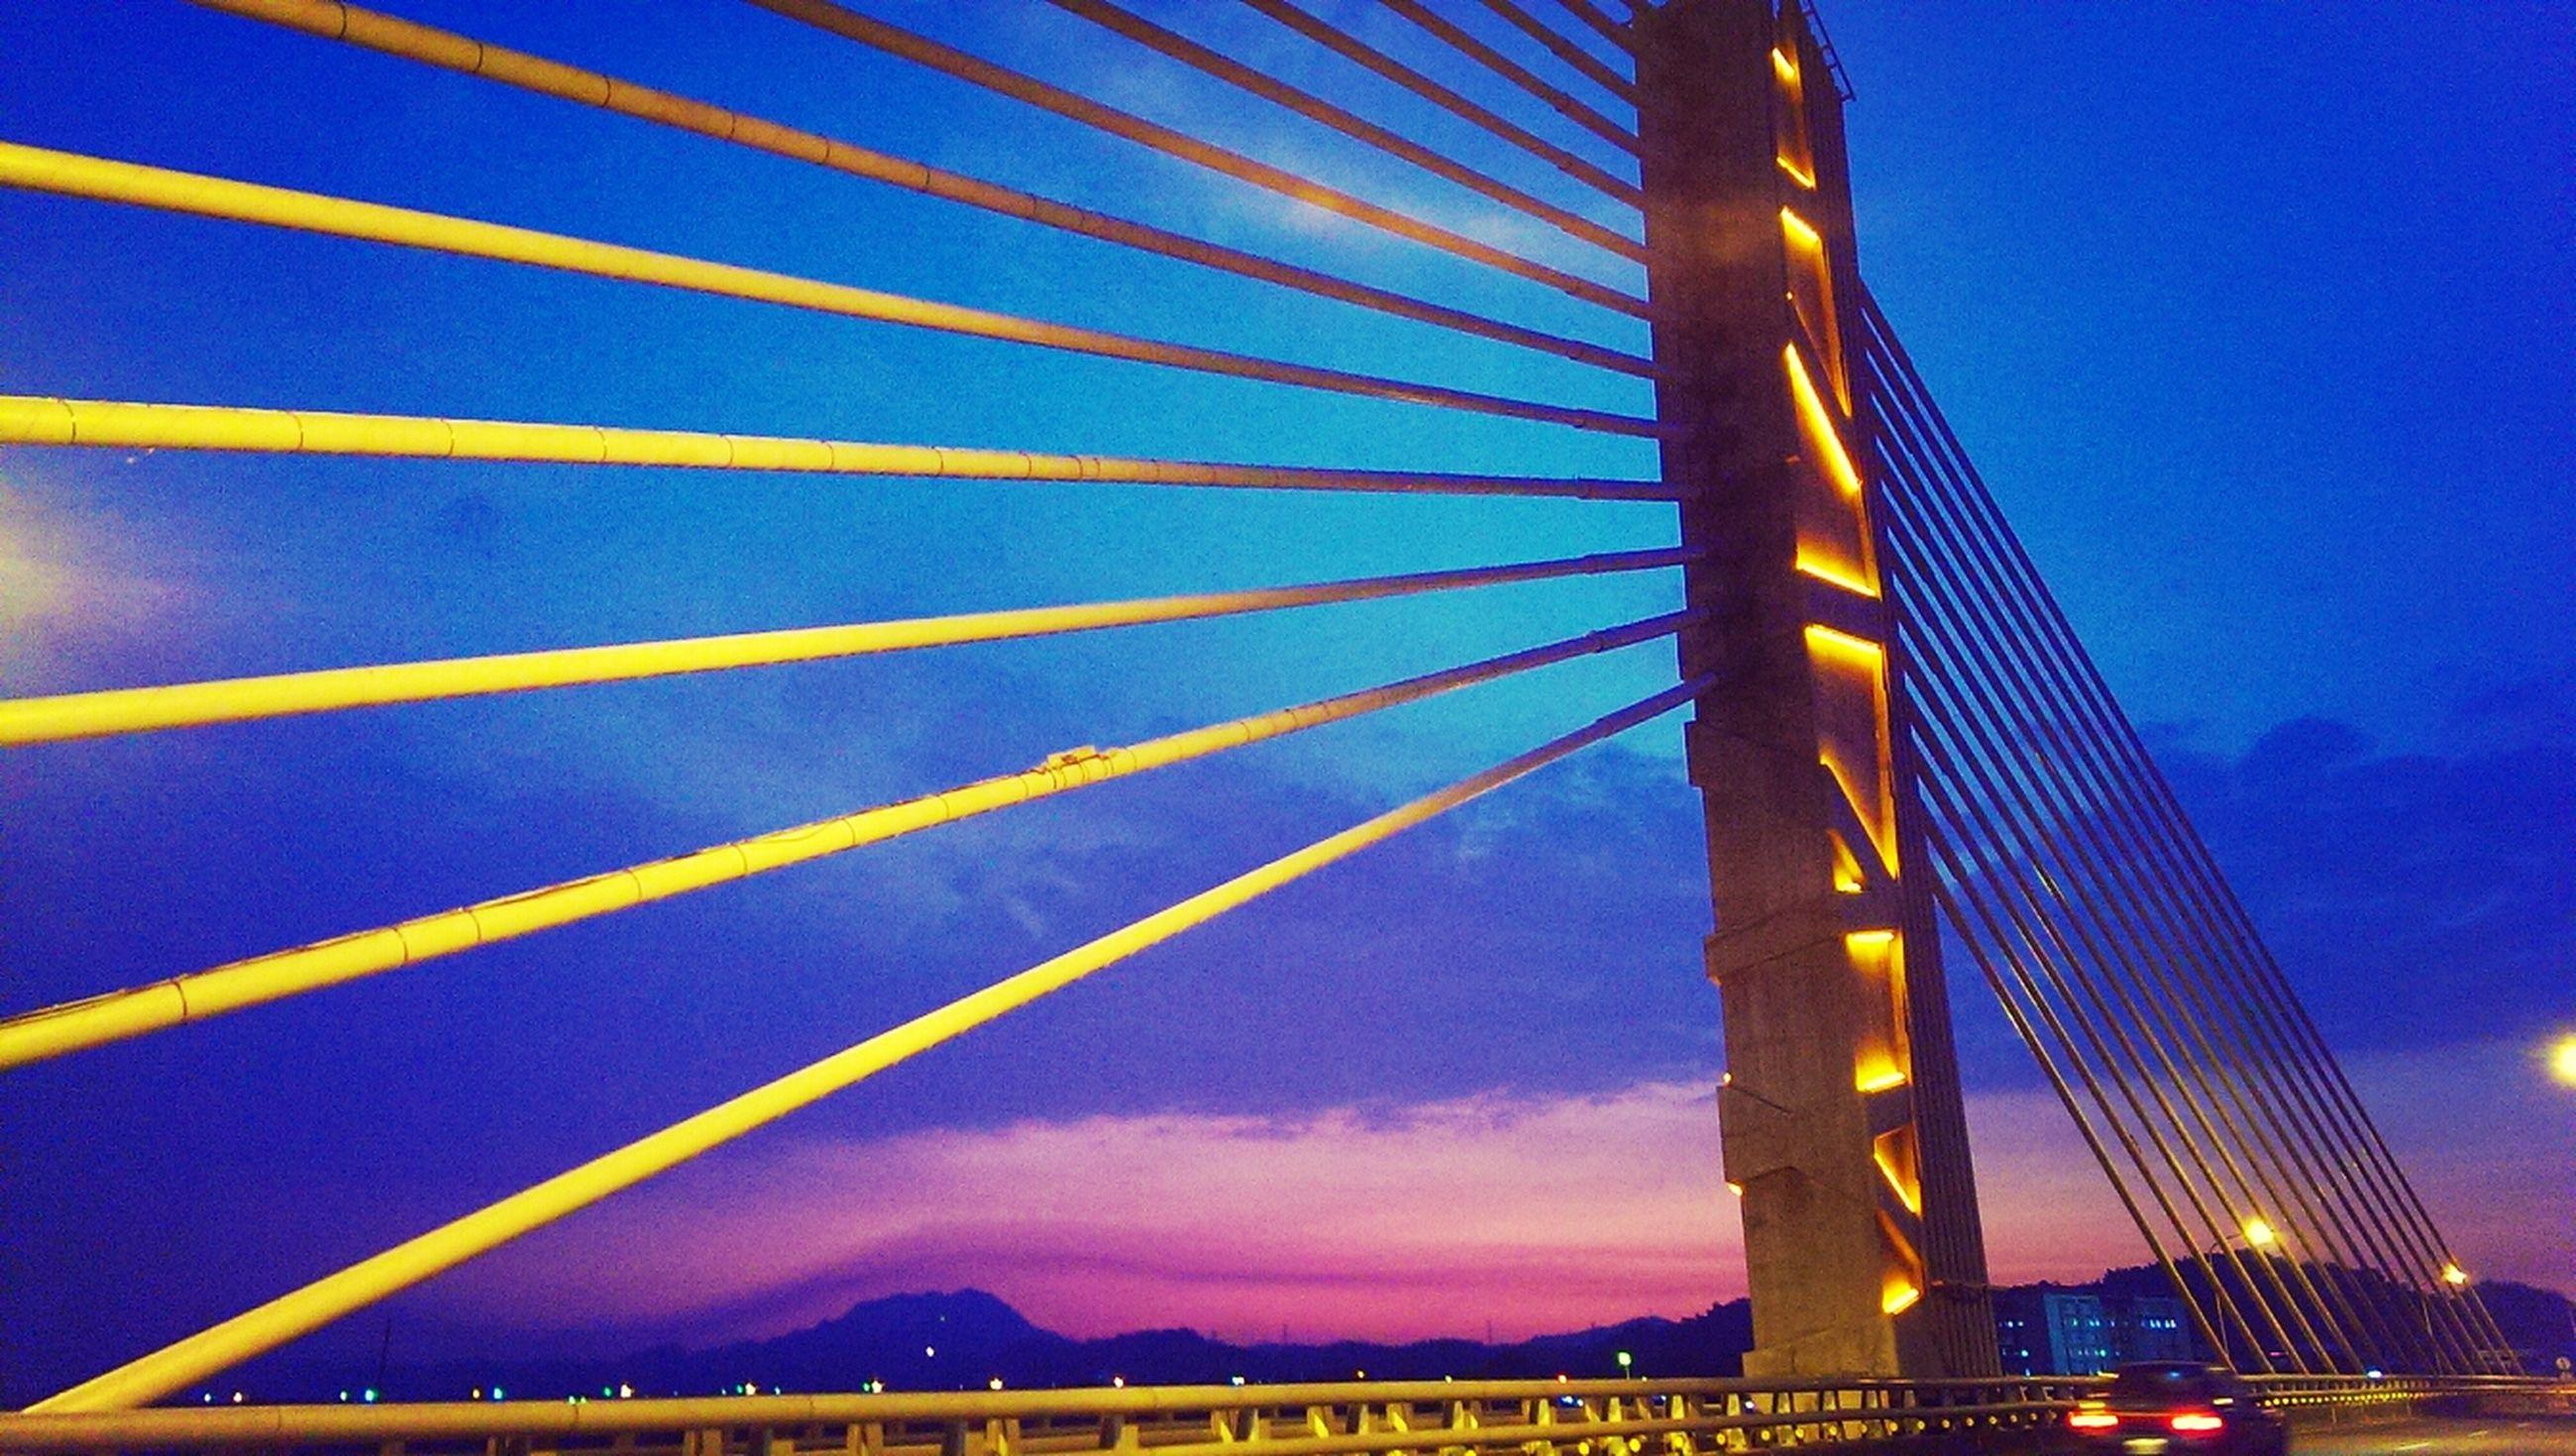 built structure, architecture, blue, illuminated, connection, sky, bridge - man made structure, suspension bridge, city, sunset, dusk, low angle view, building exterior, engineering, travel destinations, transportation, famous place, long exposure, clear sky, outdoors